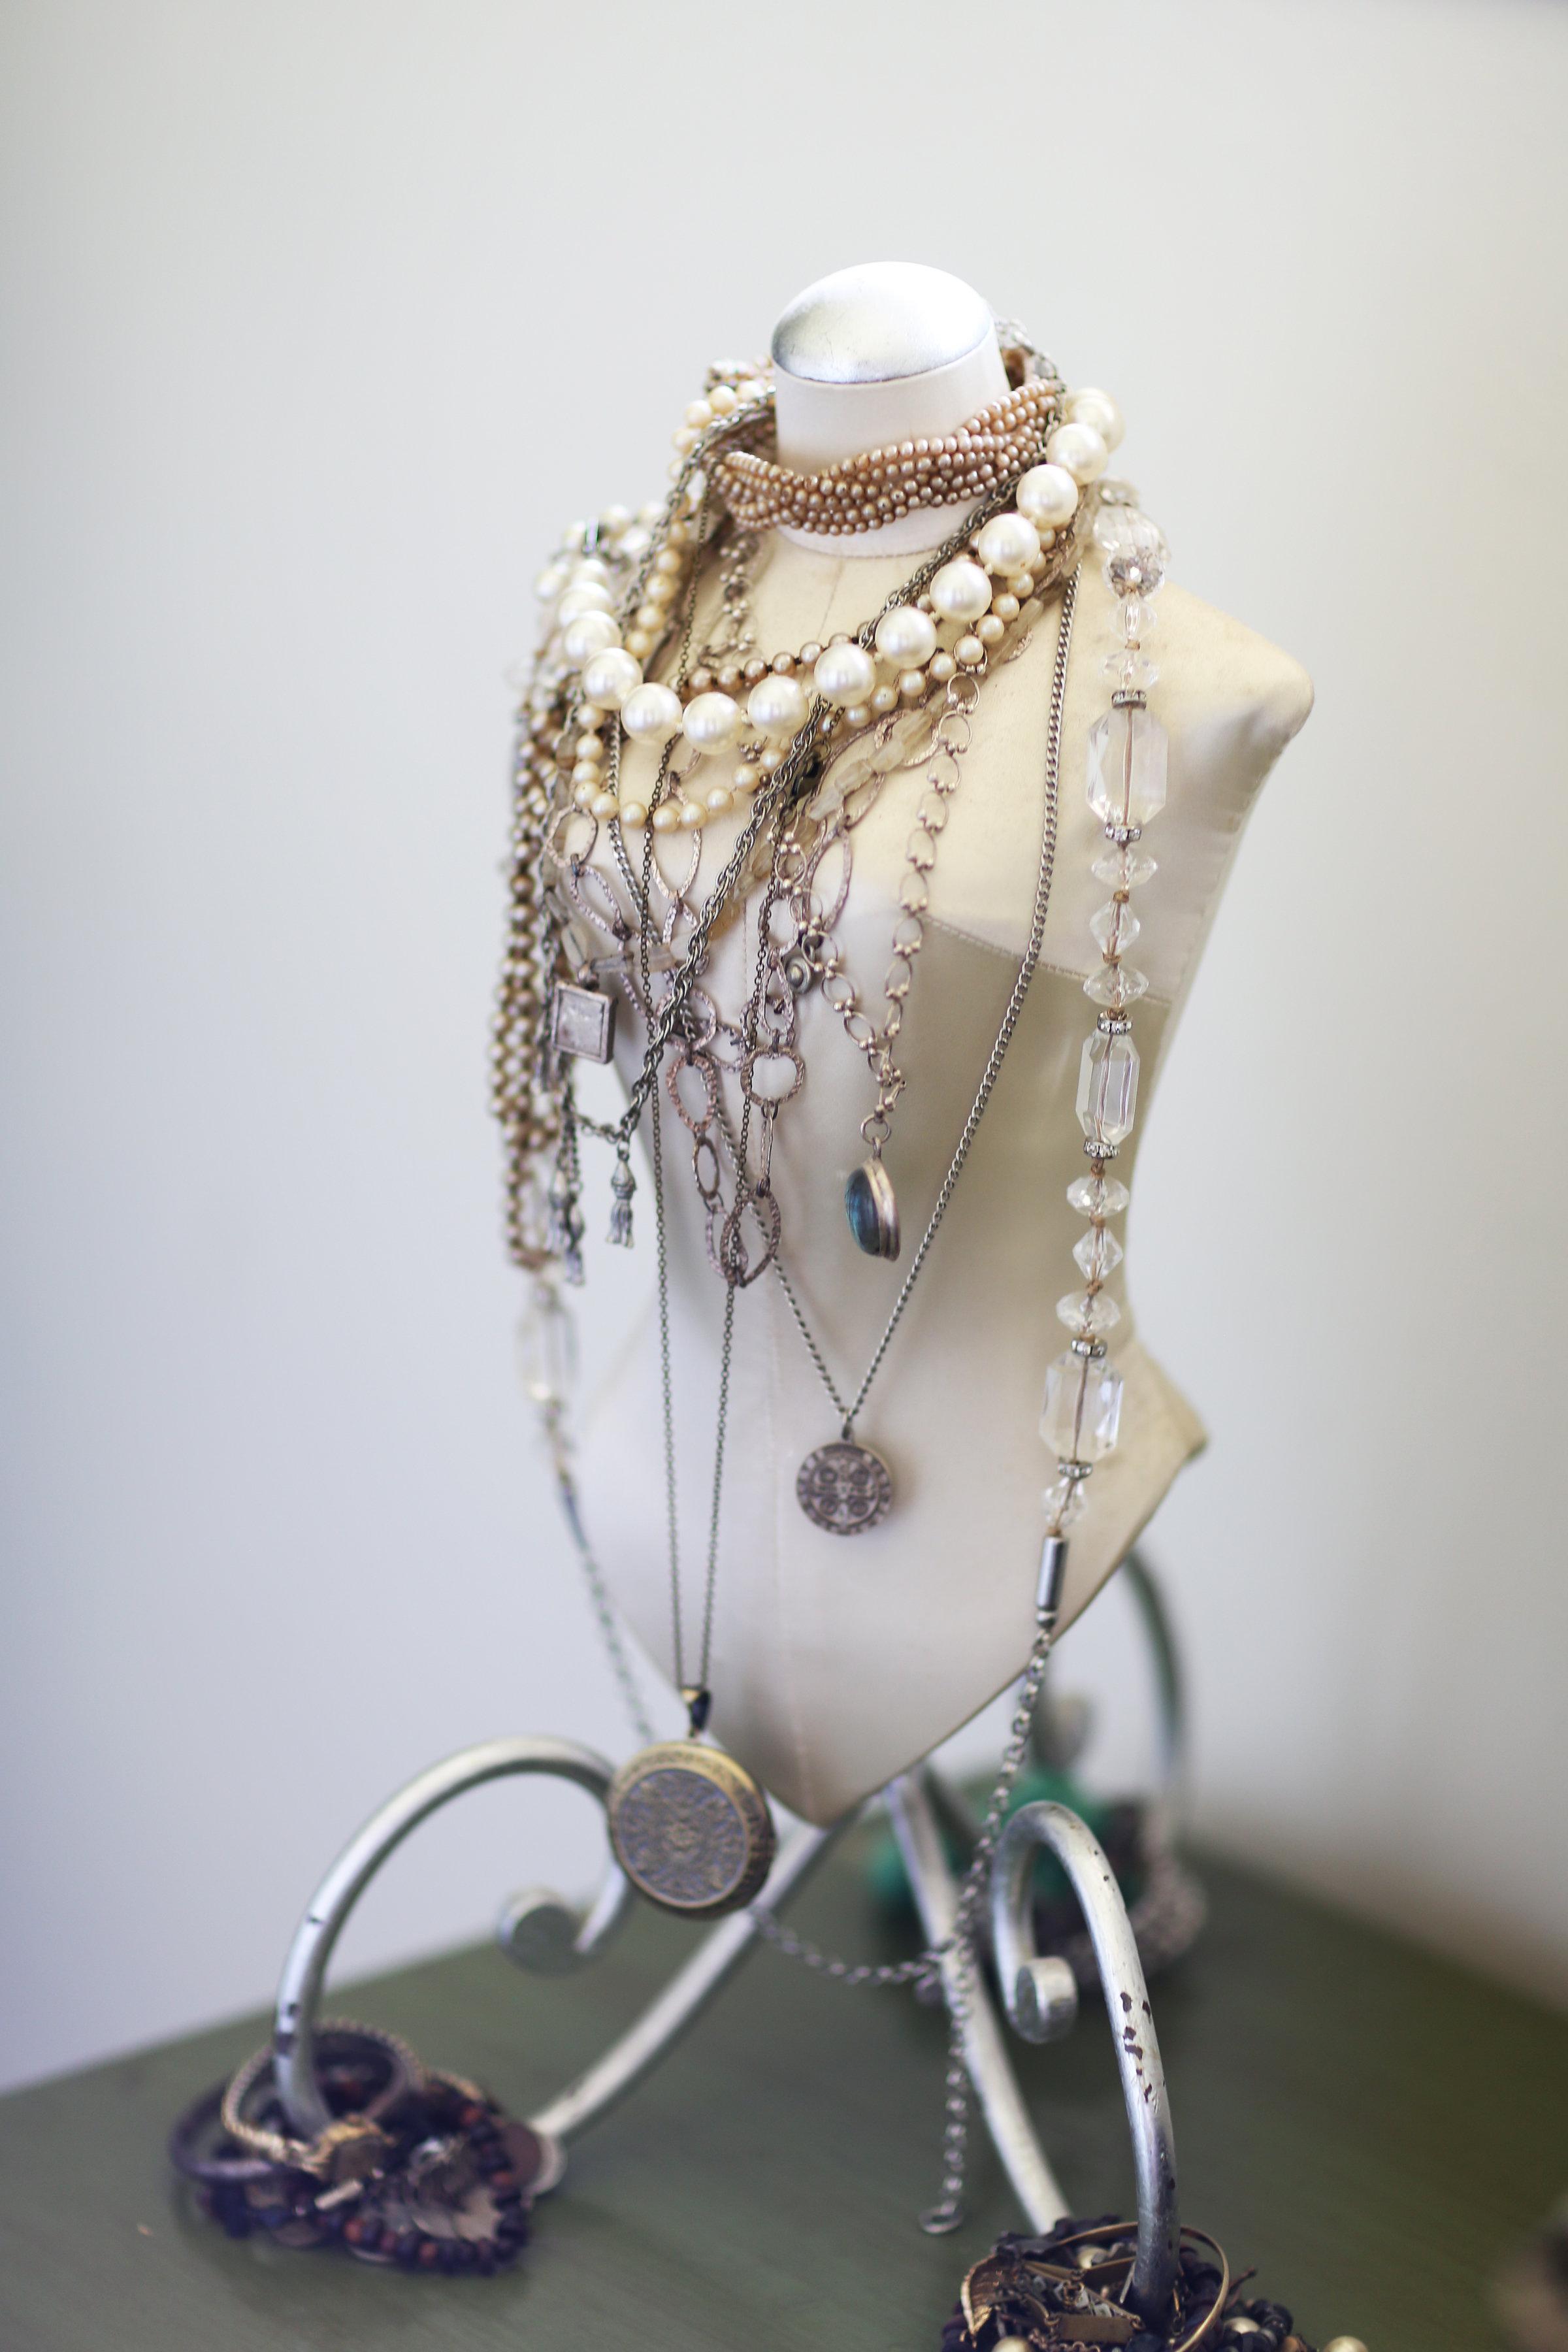 jewelry on stand